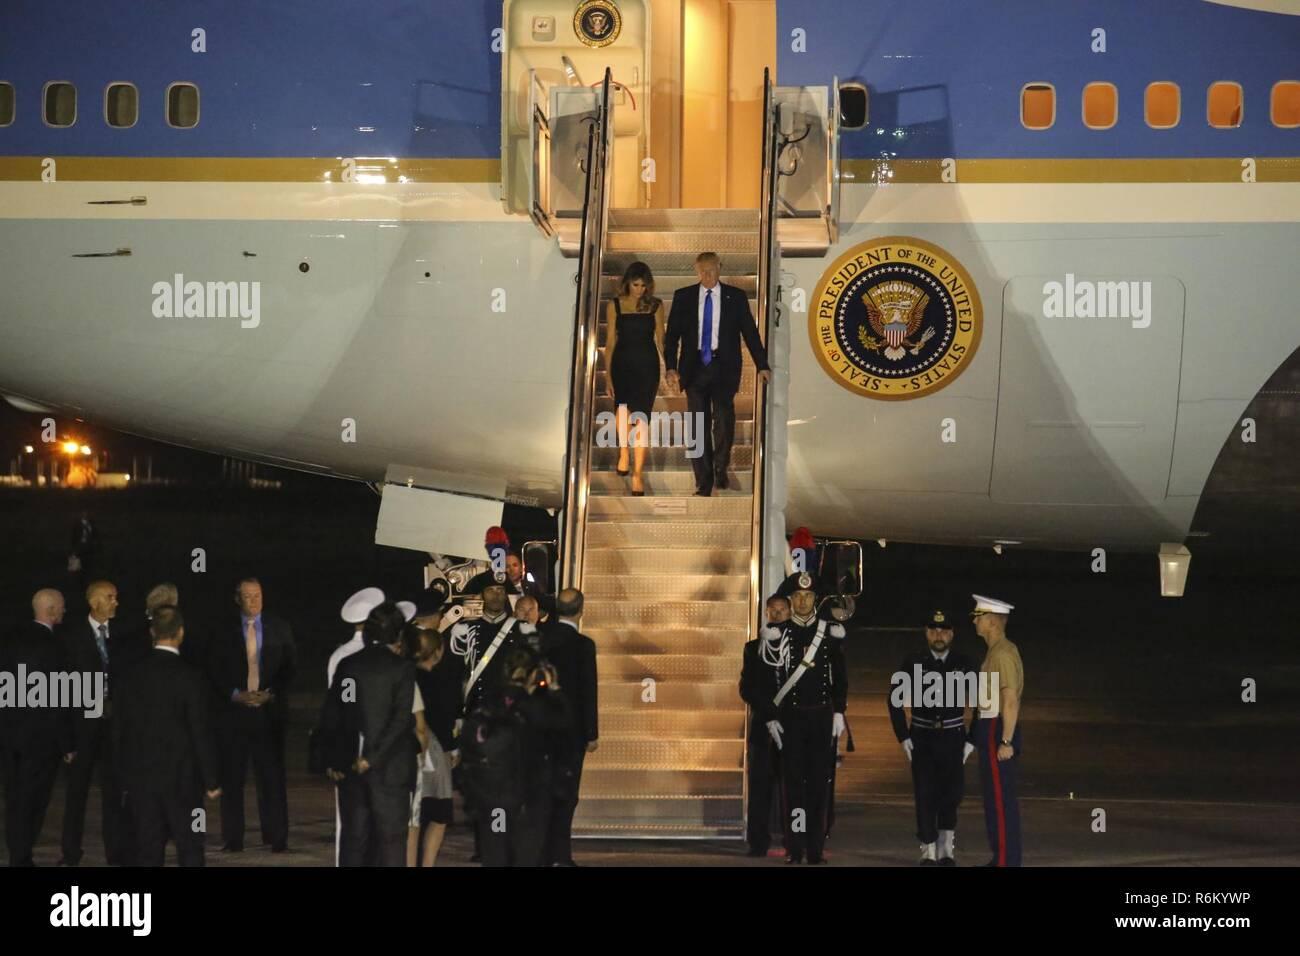 new arrival c8f3e bbe36 Presidente Donald Trump e la First Lady Melania Trump deplane Air Force One  a Naval Air Station Sigonella, Italia ...